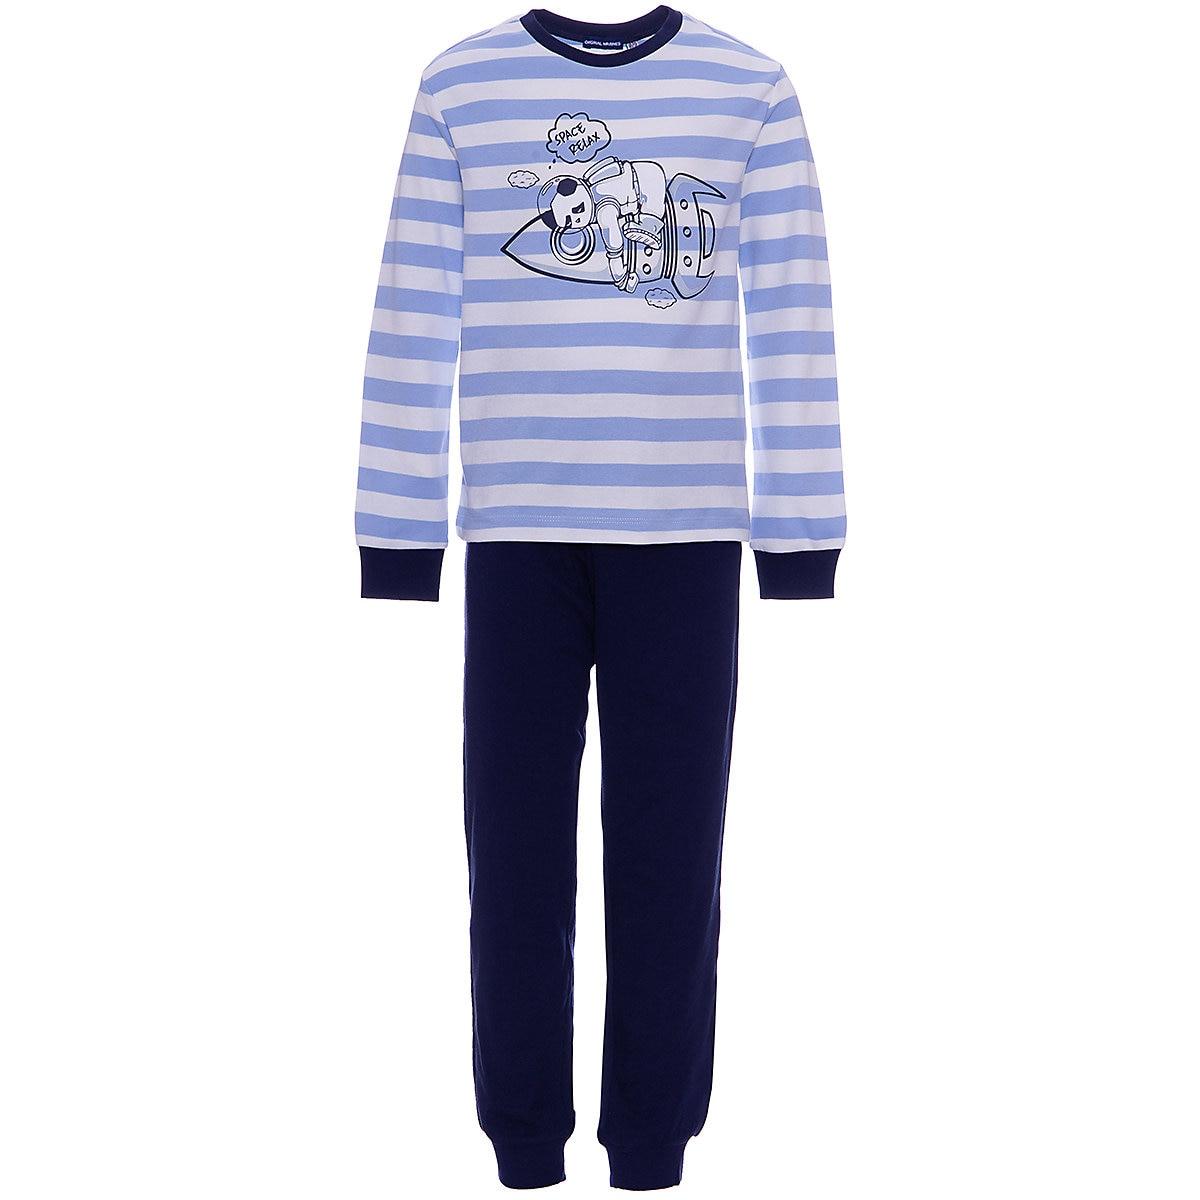 ORIGINAL MARINES Sleepwear & Robes 9500790 Cotton Baby Boys clothing pajamas db4072 dave bella autumn baby boys red clothing set patchwork clothing set